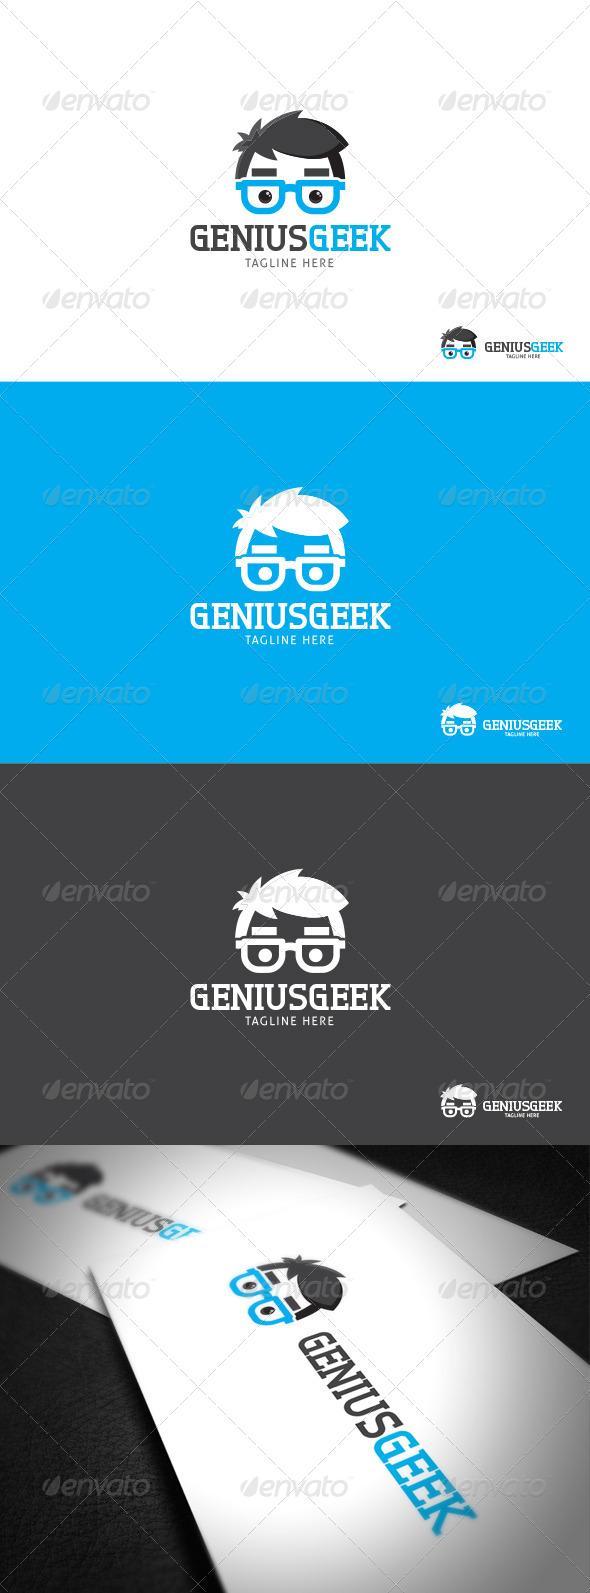 Genius Geek logo Template - Vector Abstract